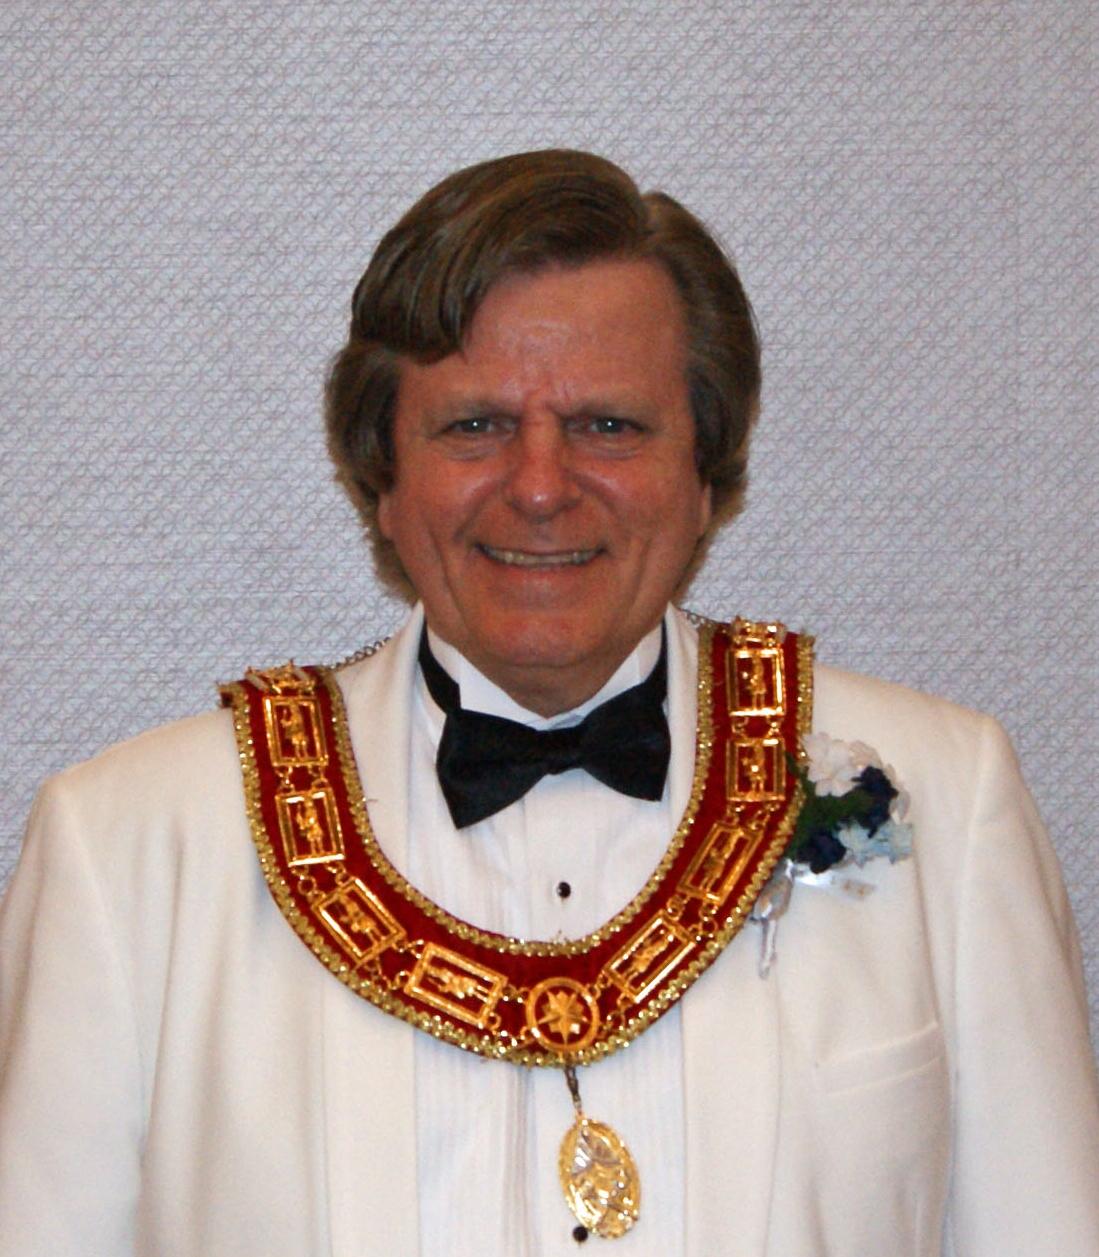 Grand Treasurer - Robert Lautenschlager